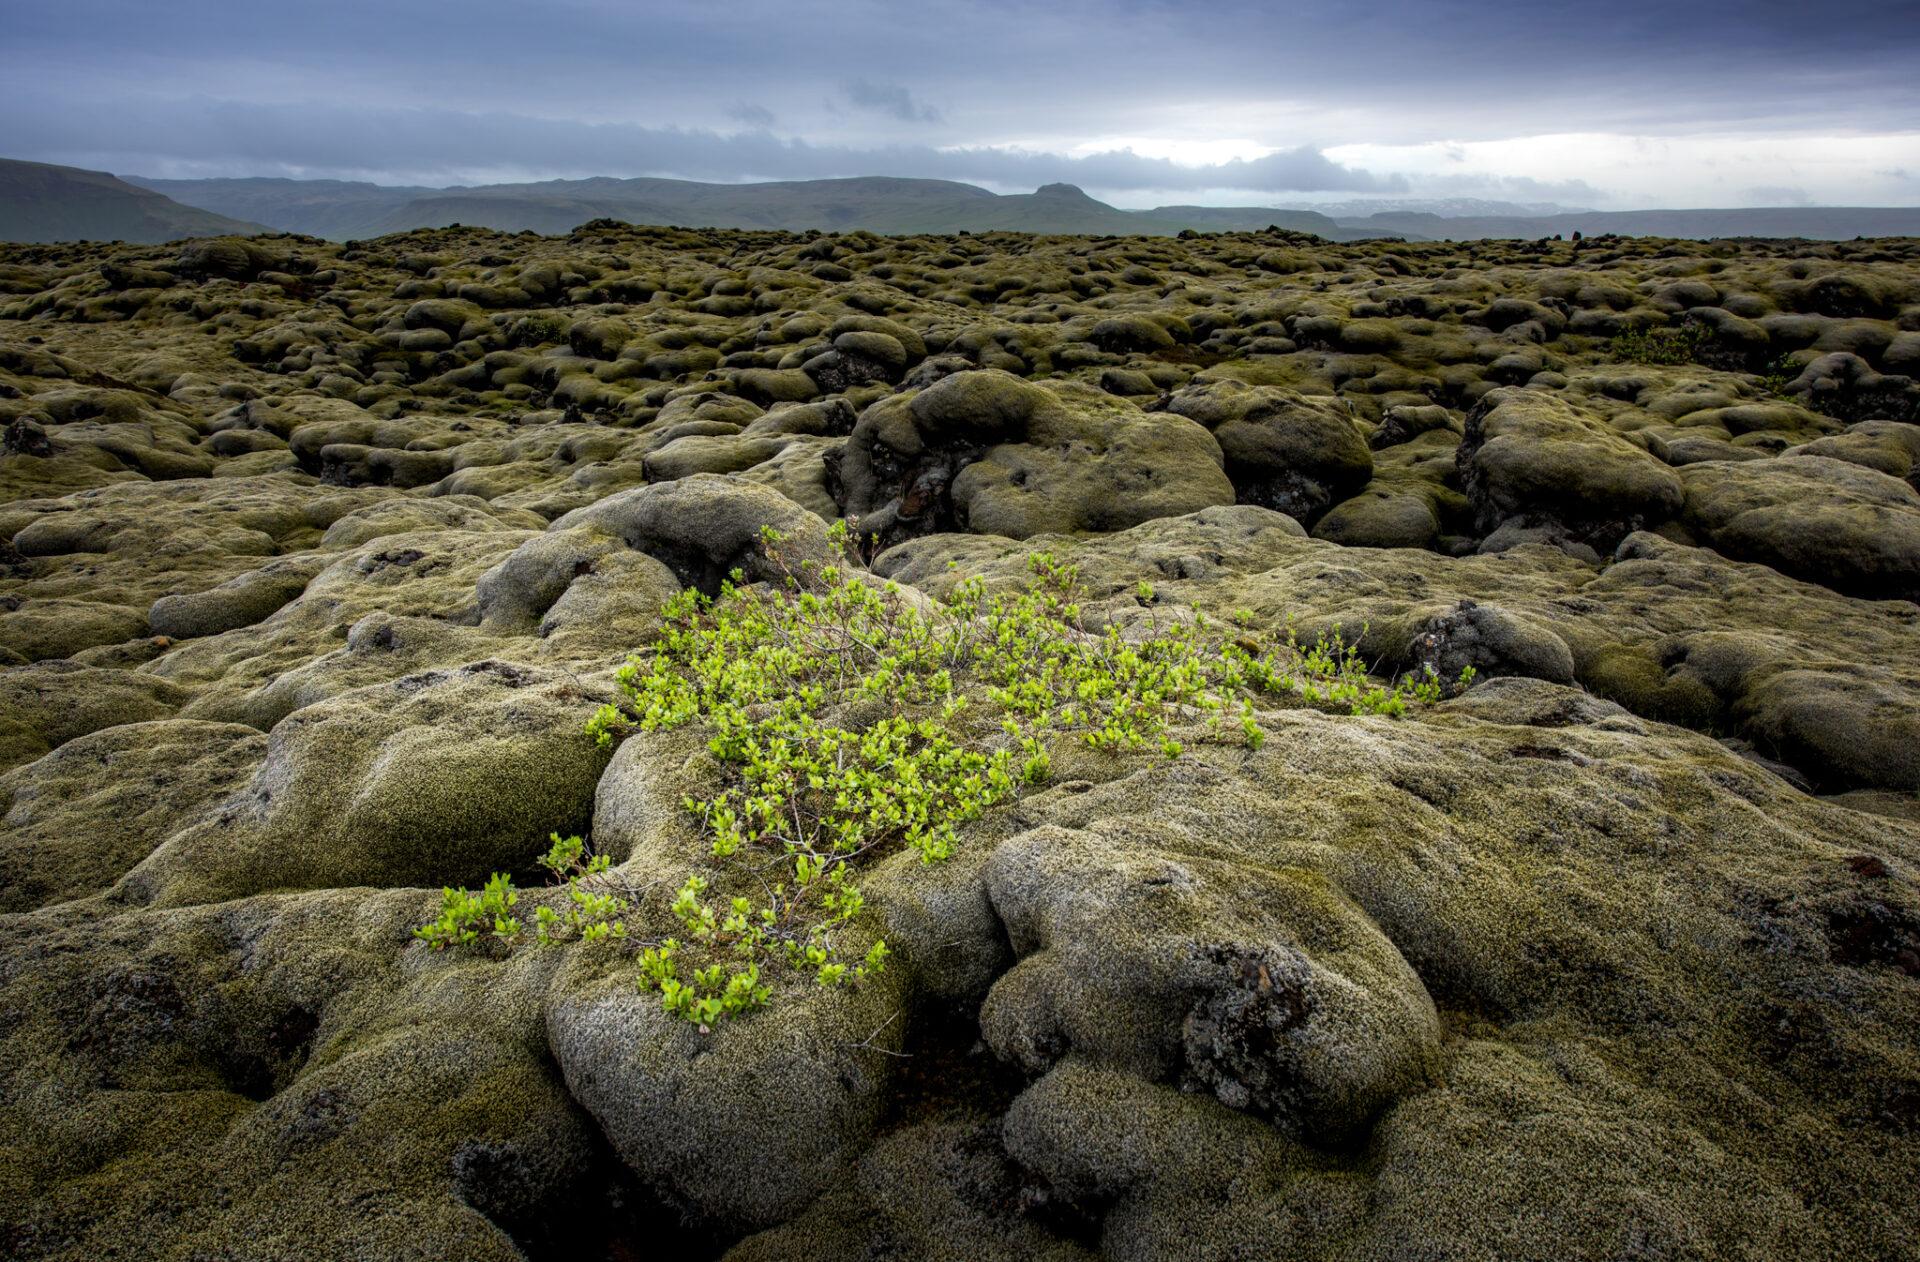 Met mos begroeide lavavelden